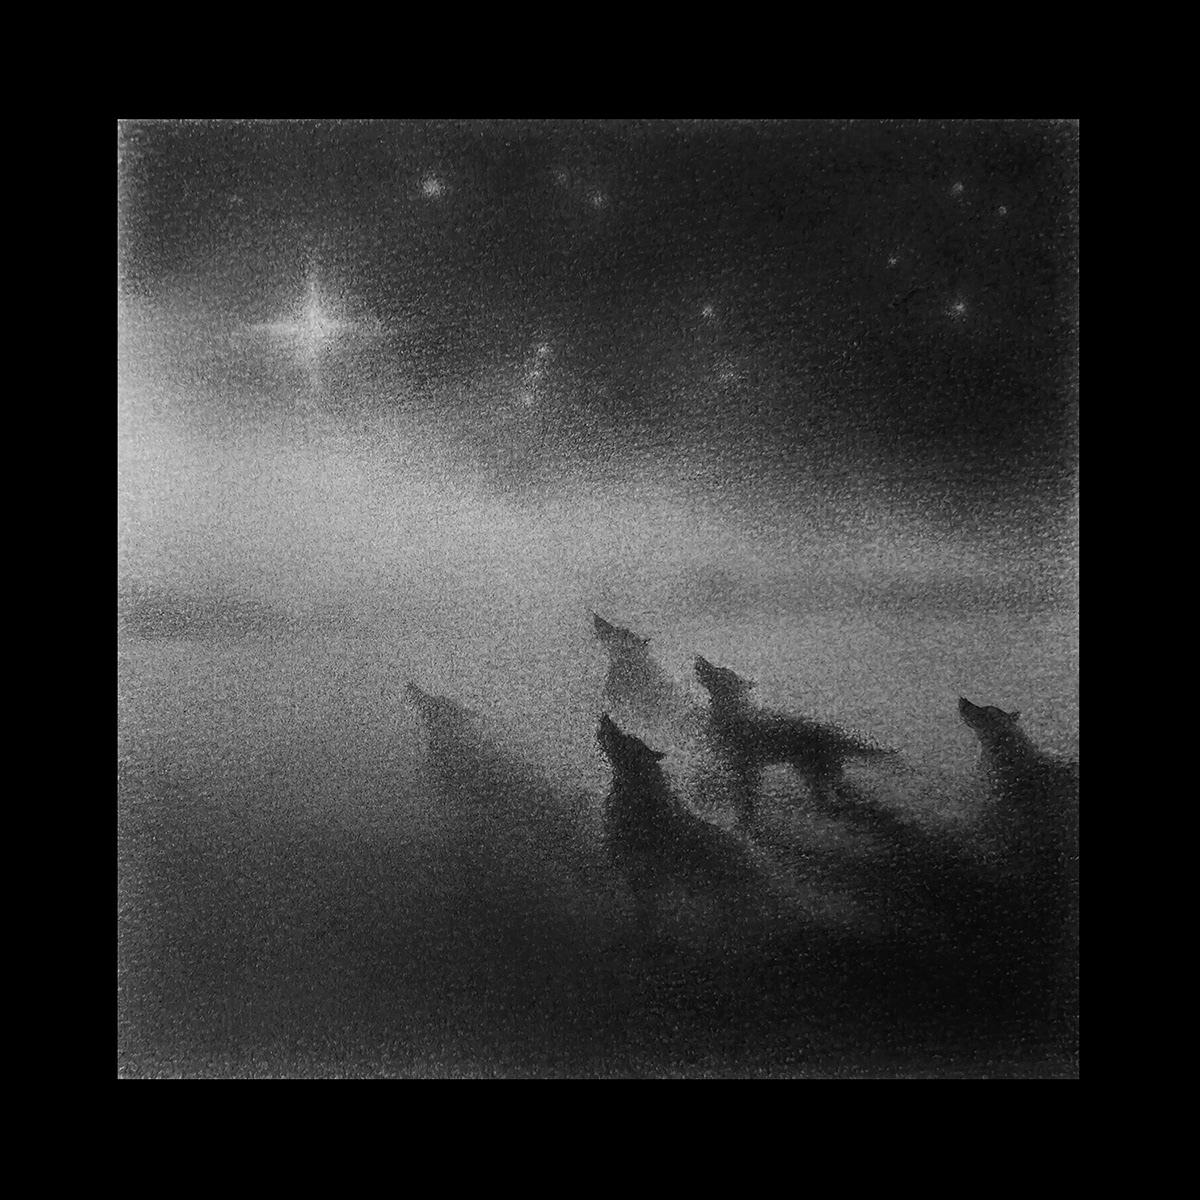 animal blackandwhite bw children Drawing  monochrome Nature painting   stars wolves